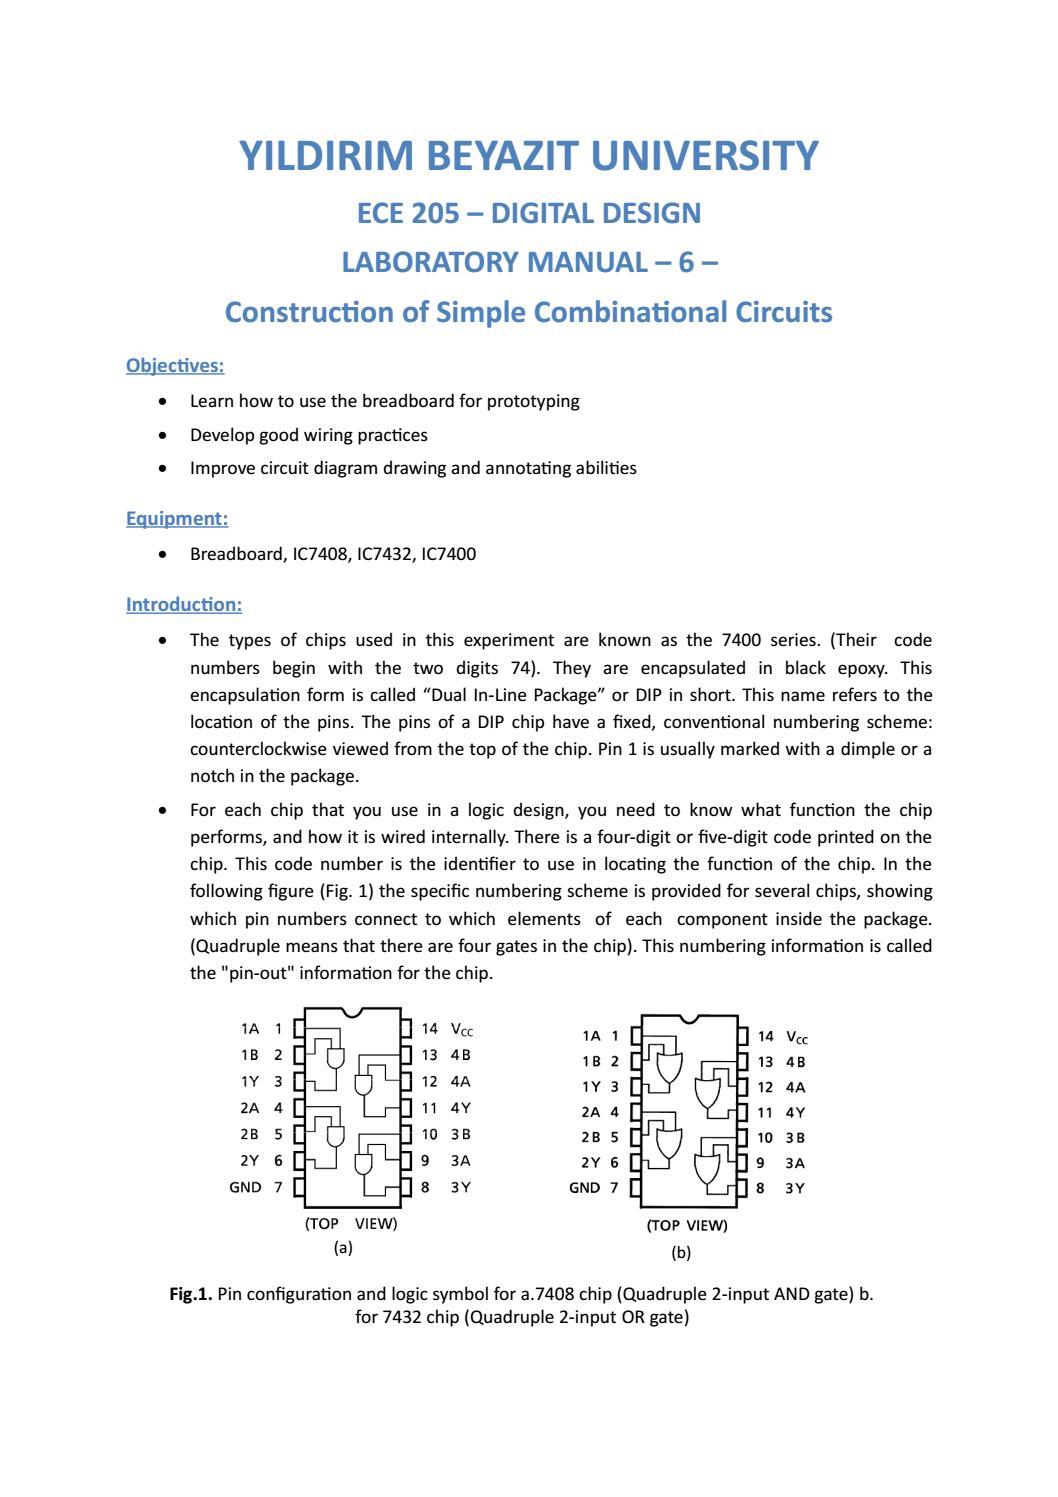 Ee205 Lab Manual 4 1 By Van N Gassa Issuu 7400 Quad 2input Nand Gate Pin Layout